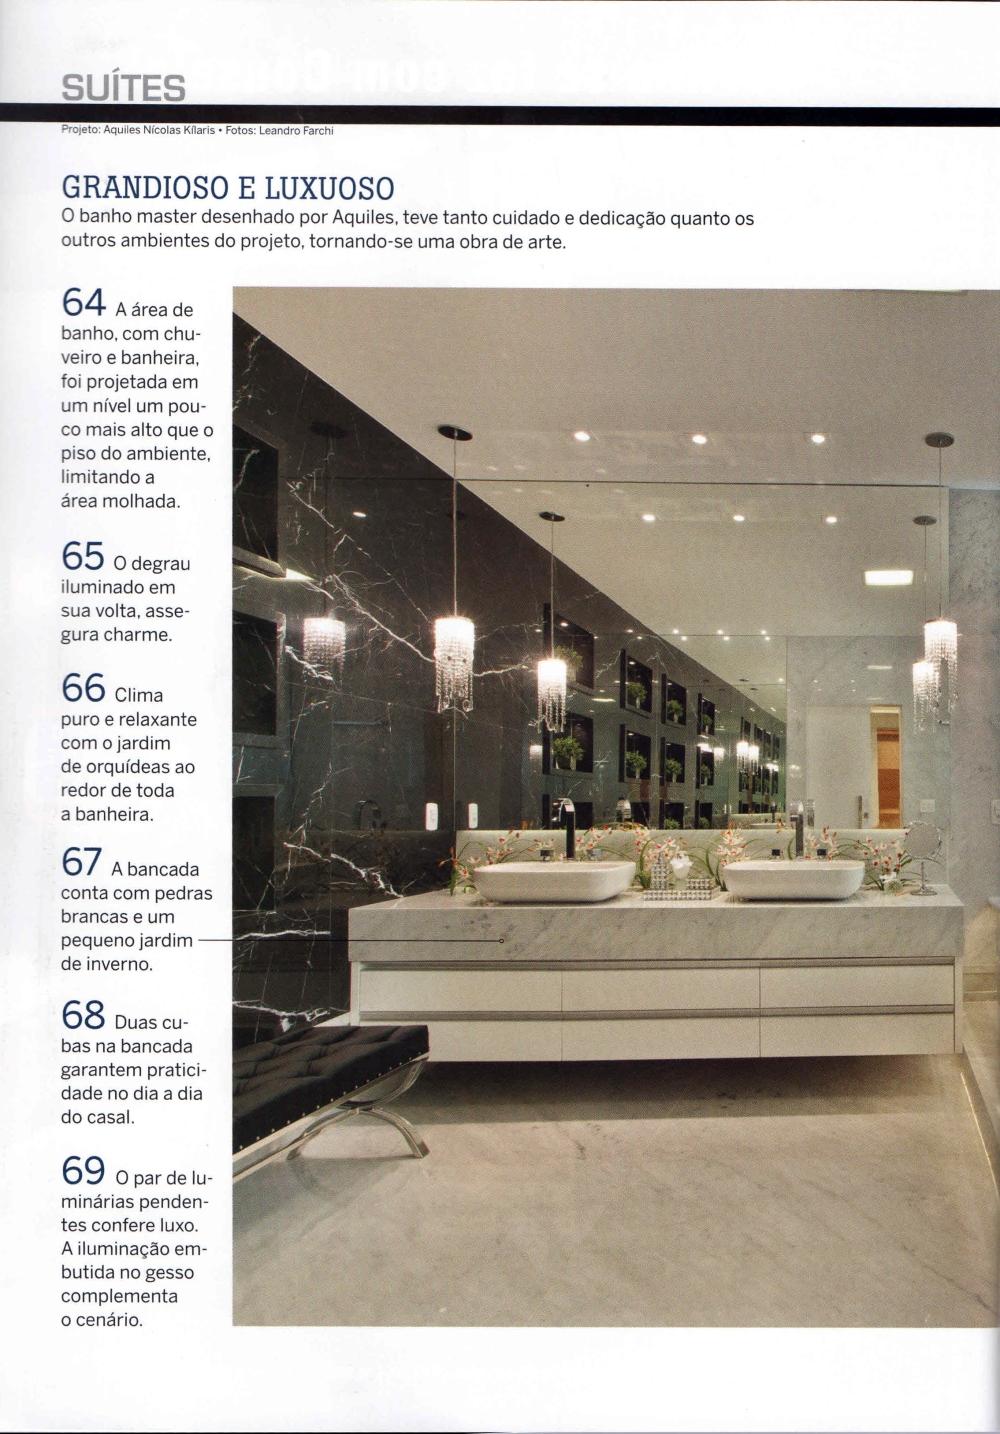 Arquiteto Aquiles Nicolas Kilaris Revista Guia 1001 ideias (4)